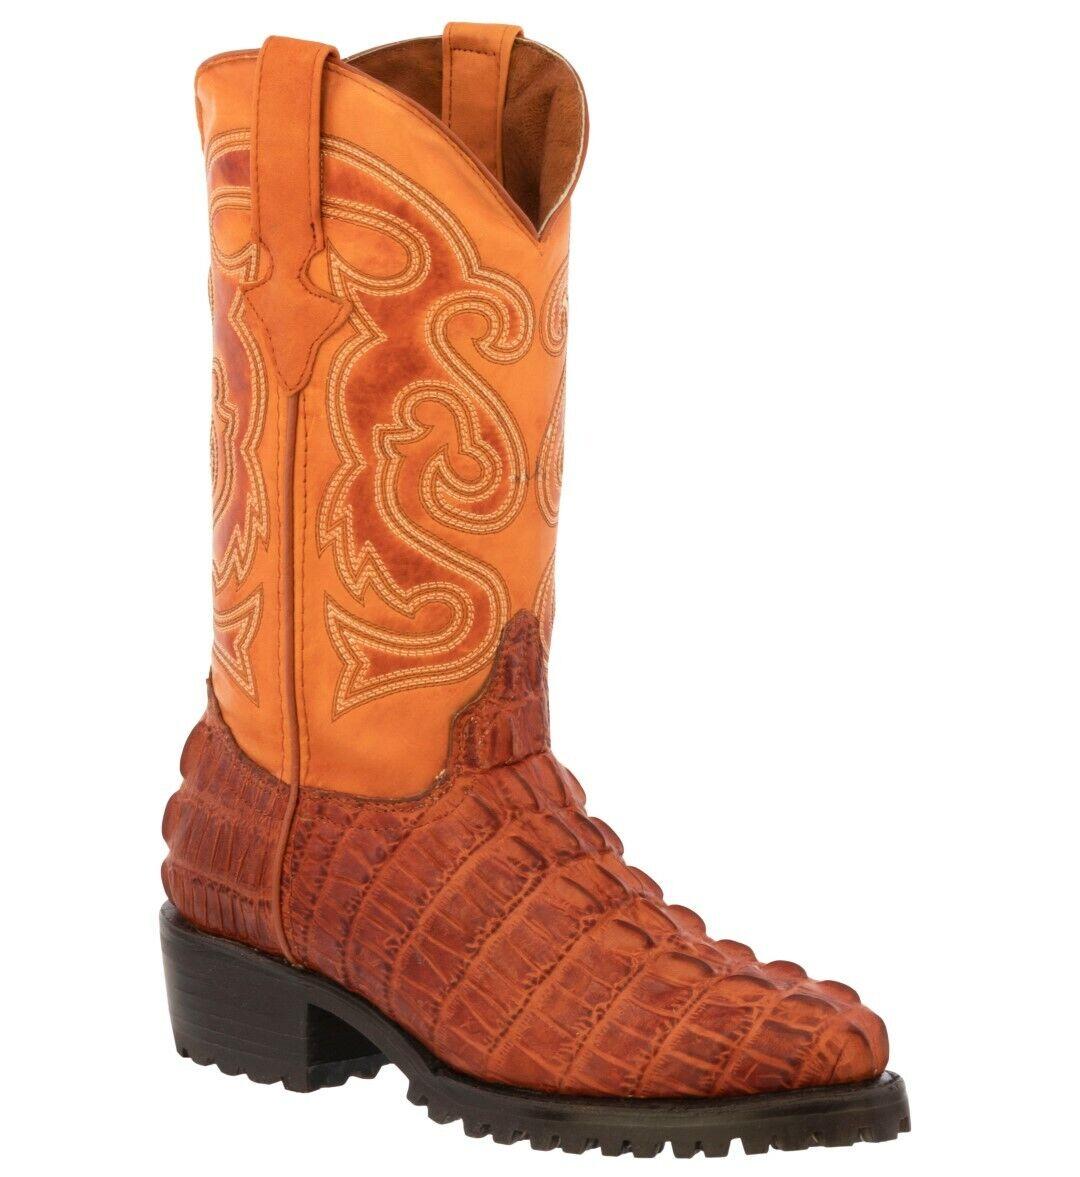 Mens Motorcycle Biker Boots Alligator Pattern Leather Cognac Cowboy Round Toe